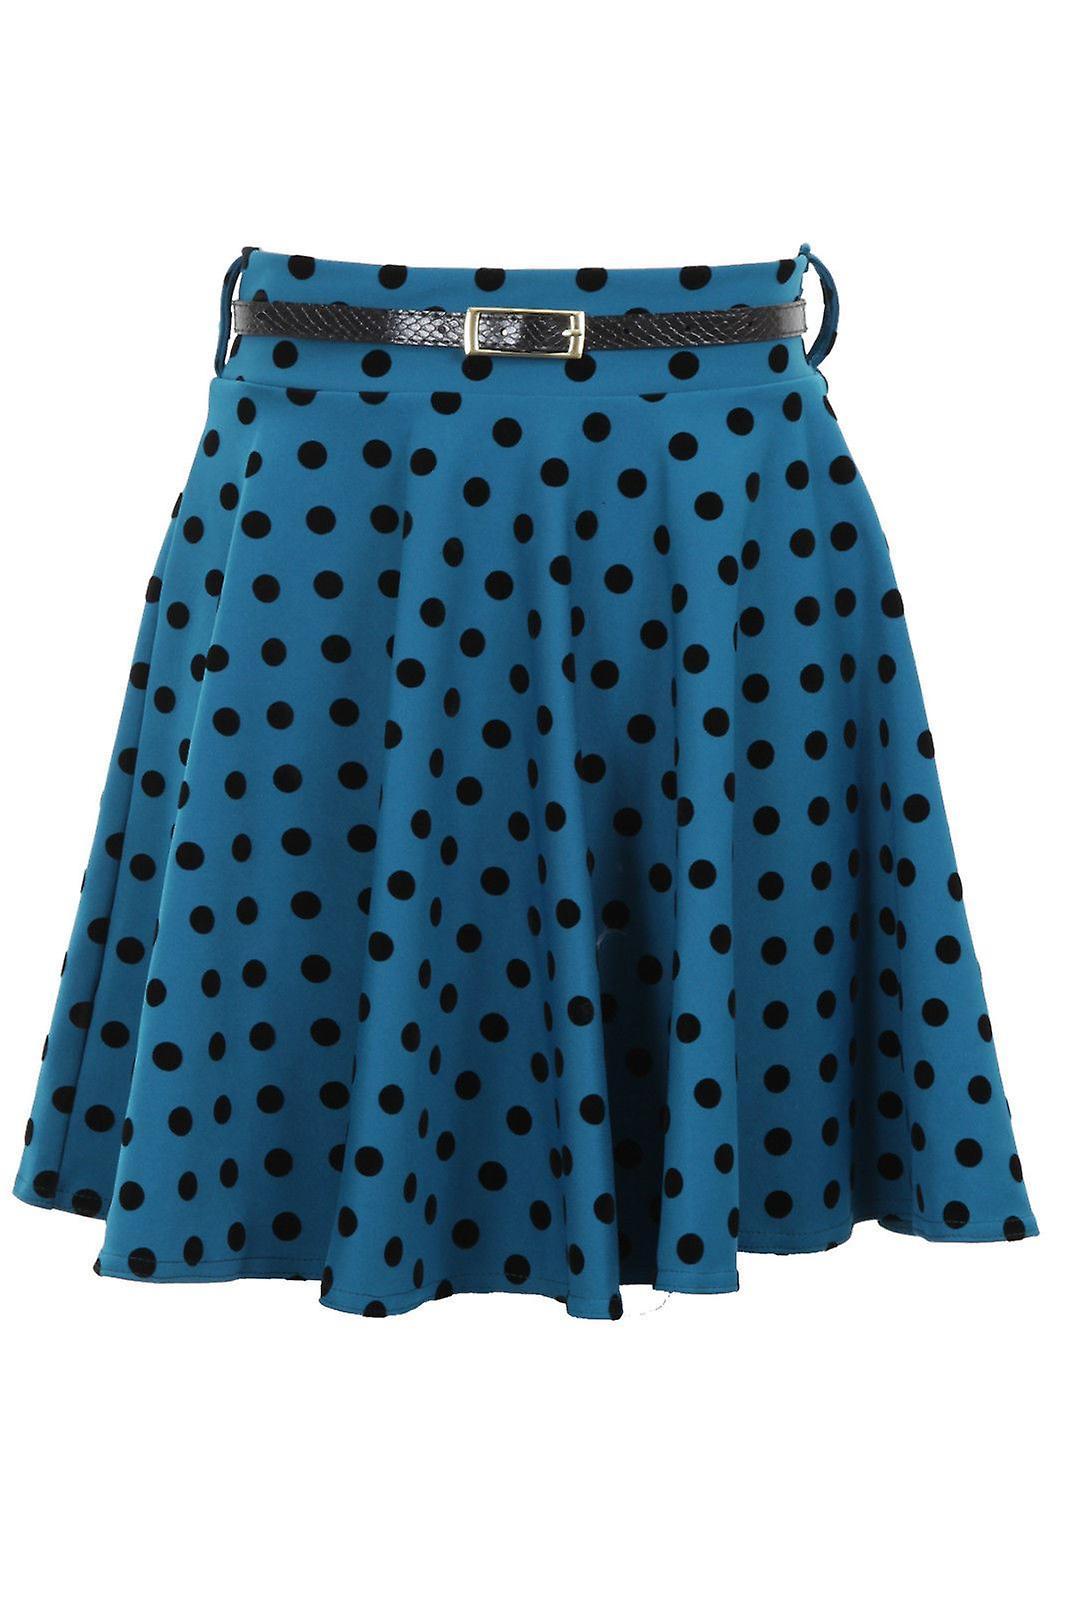 New Ladies Belted Polka Dot Spotted Short Flare Dress Women's Skirt